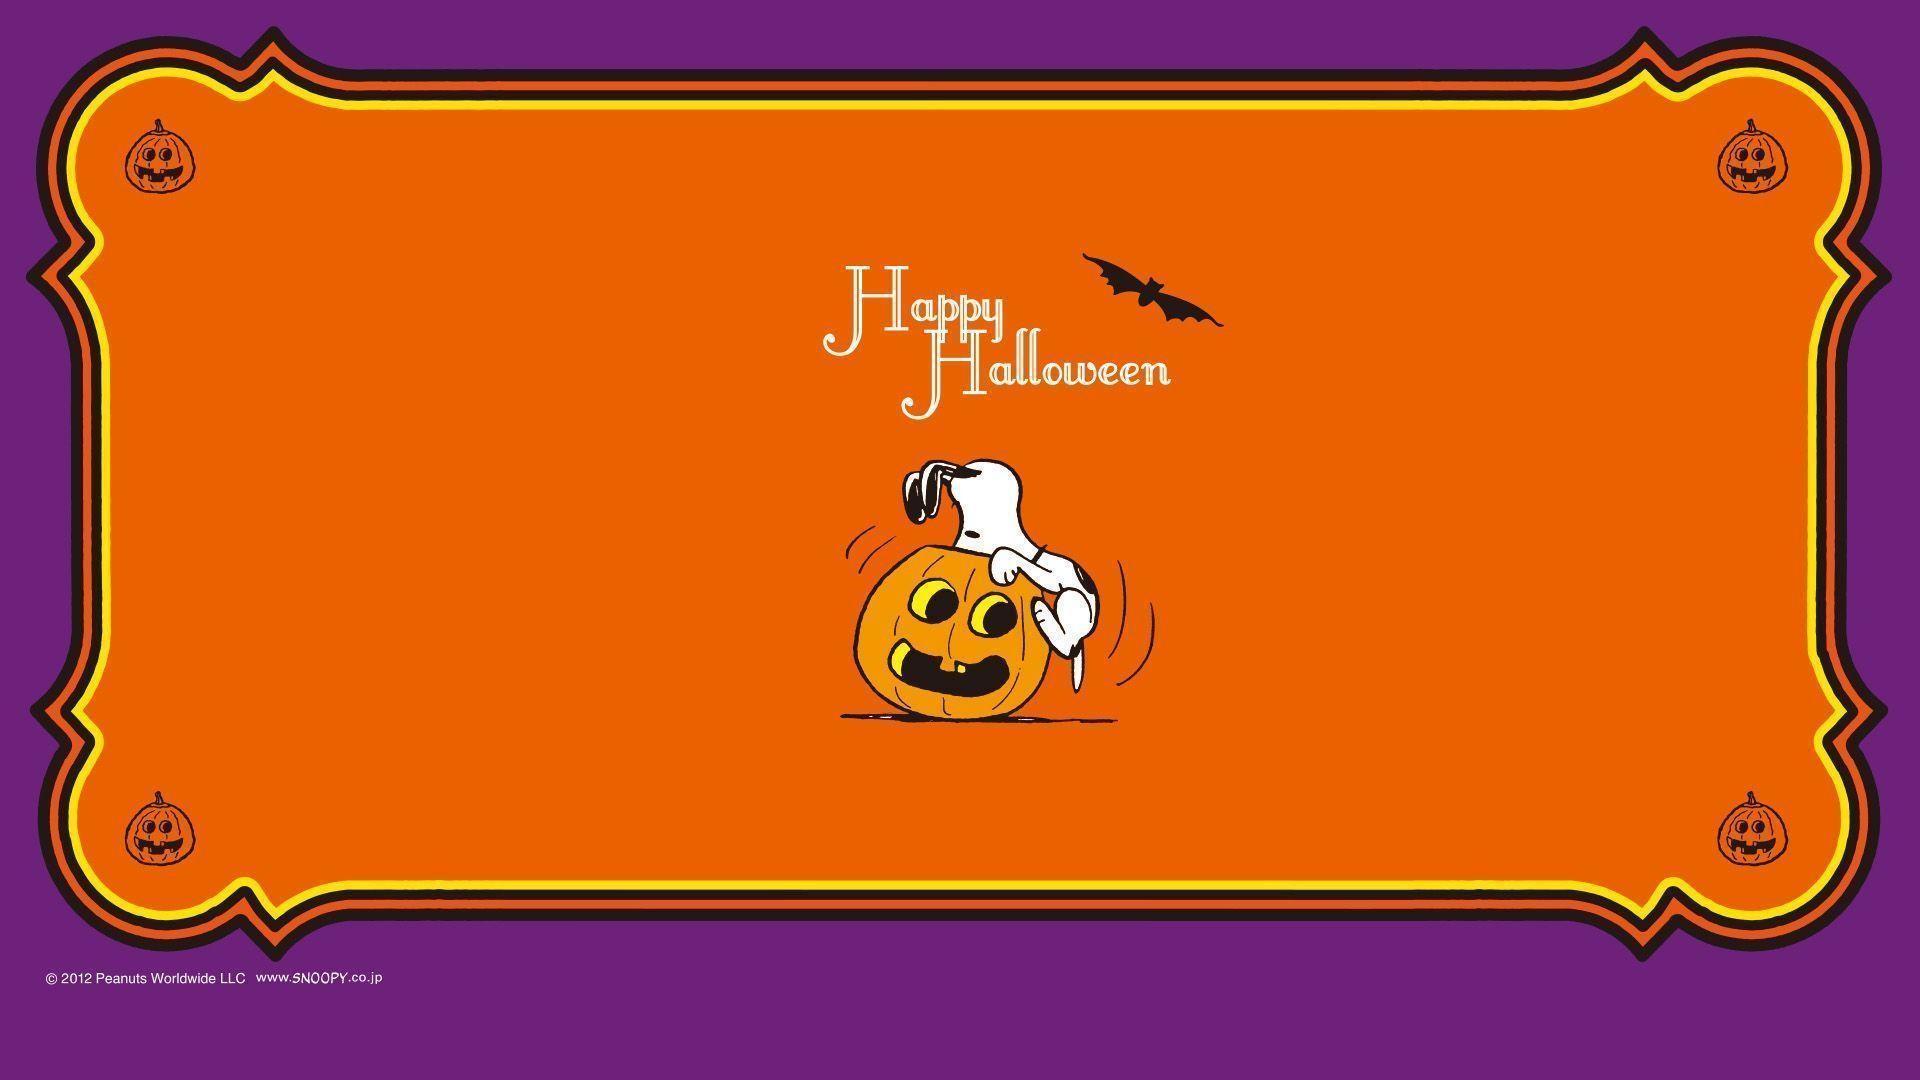 Snoopy Halloween Wallpaper HD